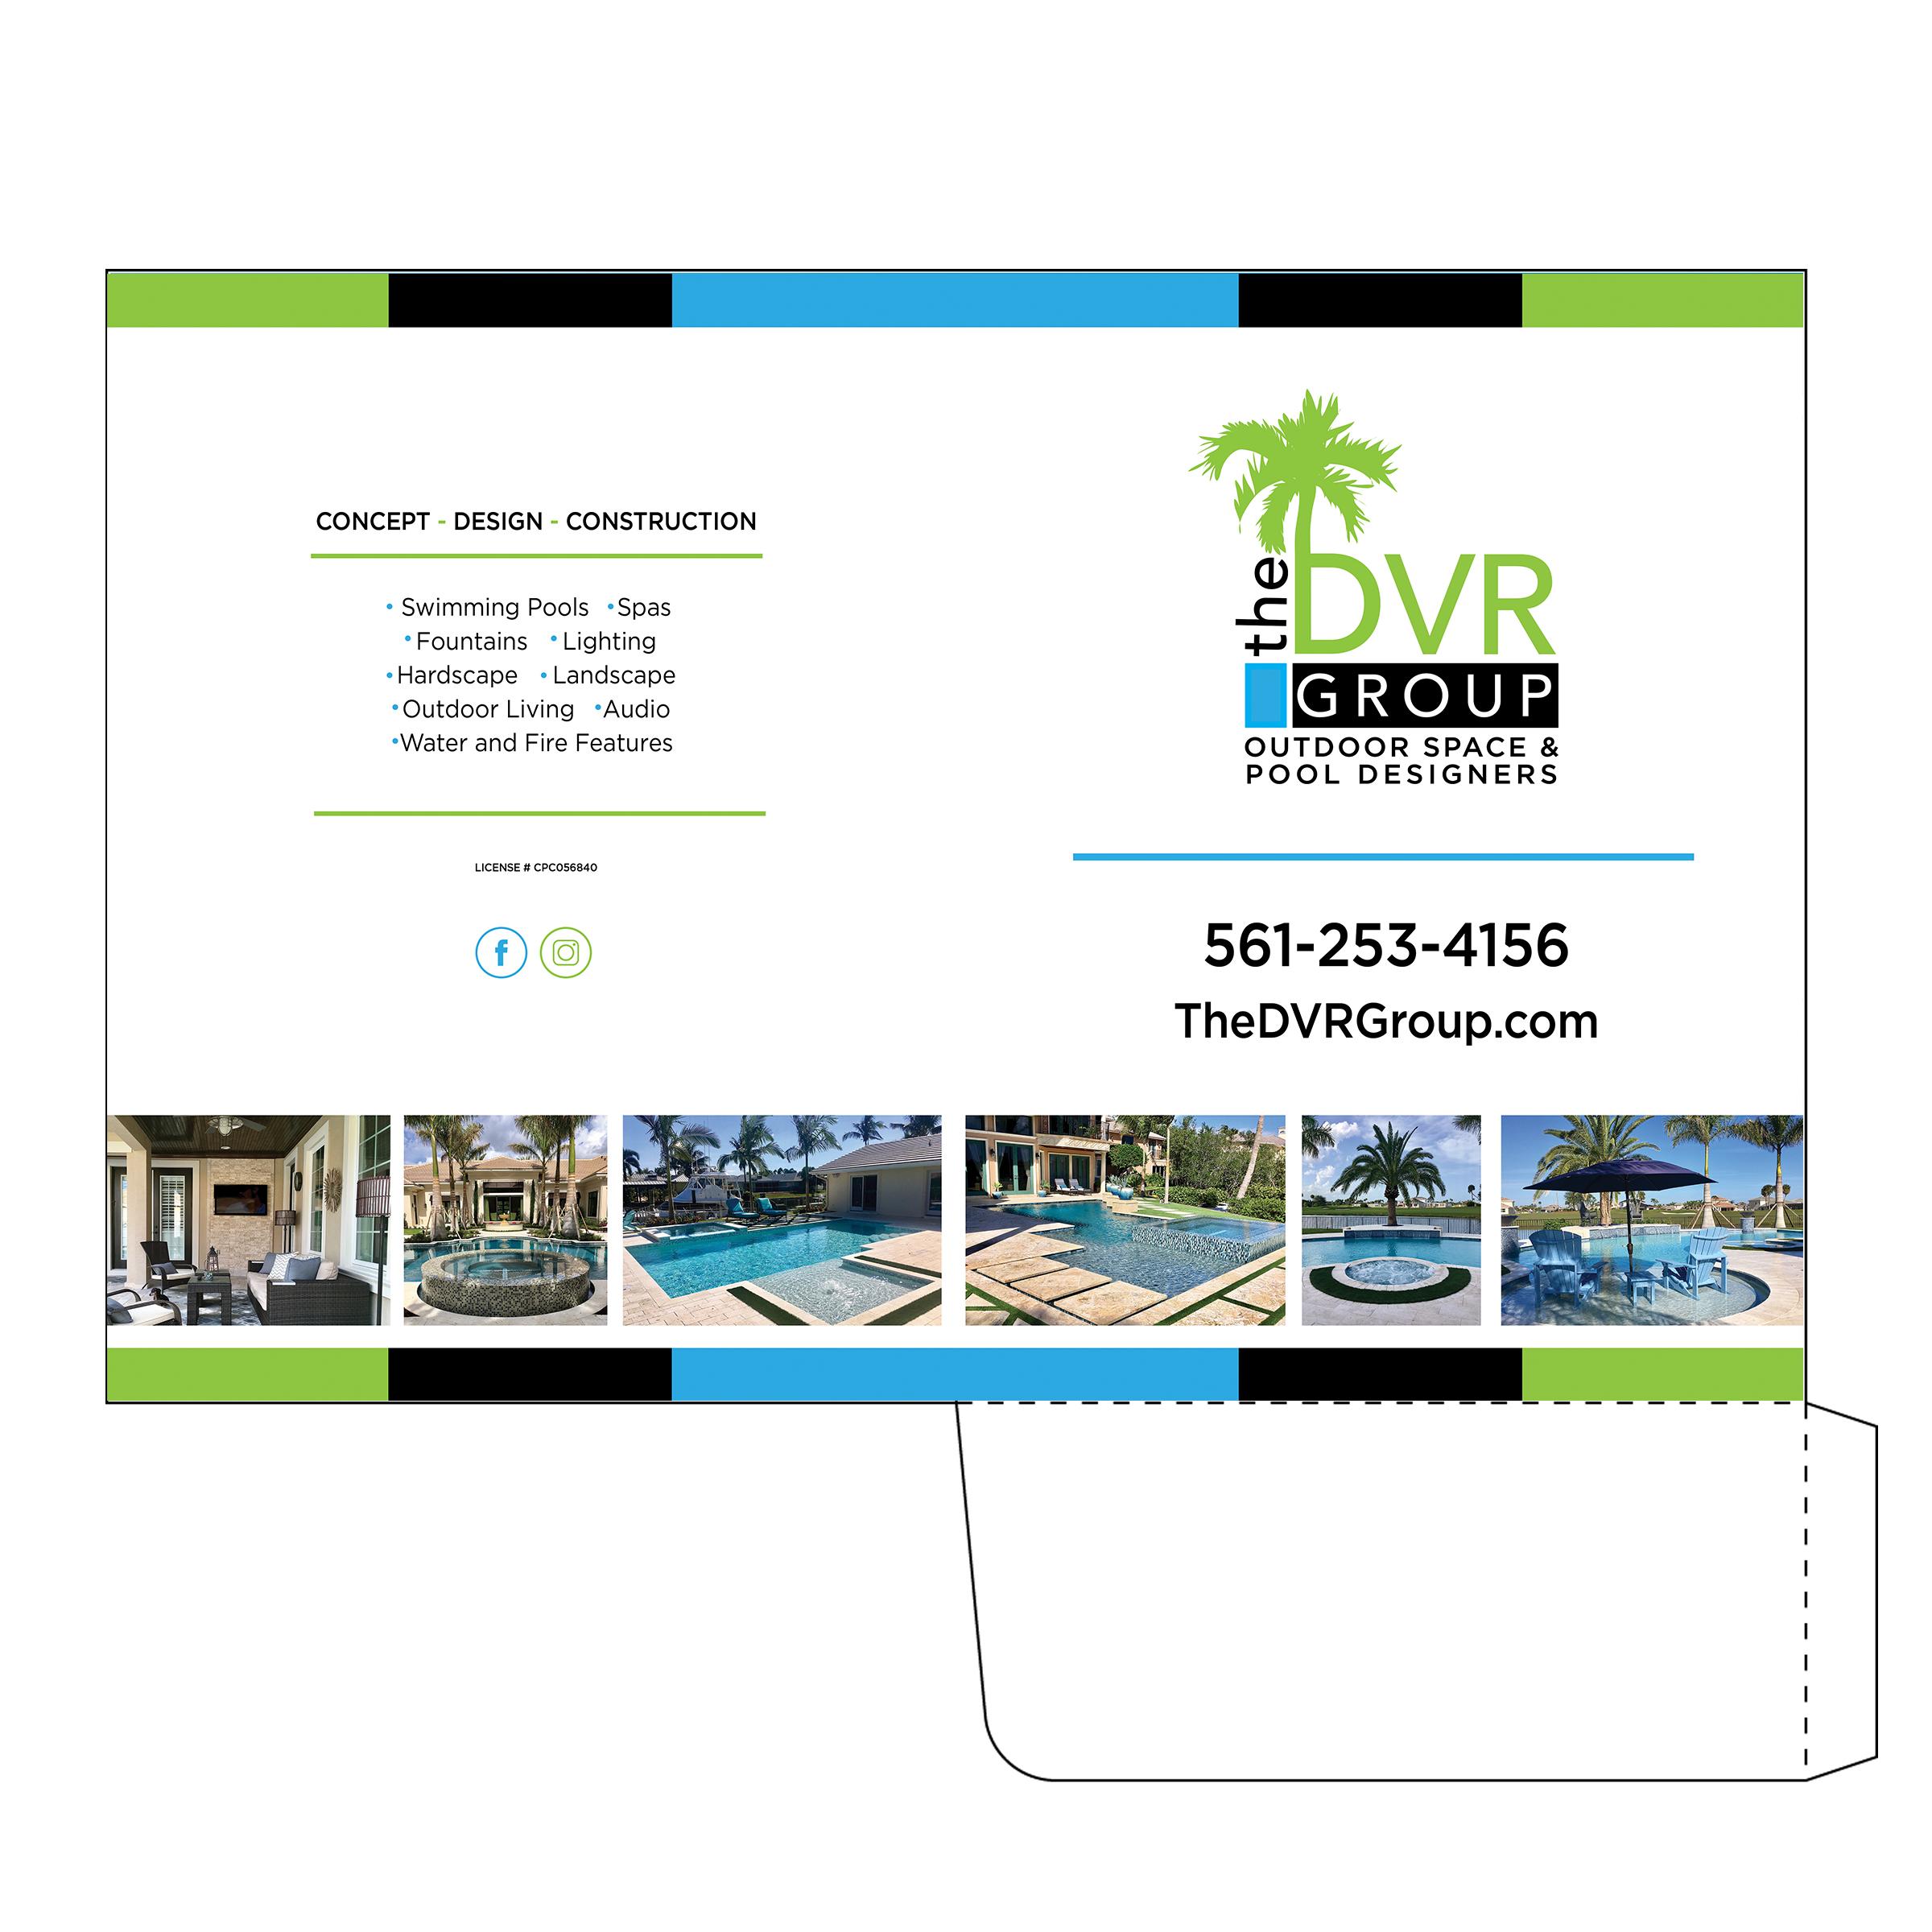 Pool Construction Company Folder Design